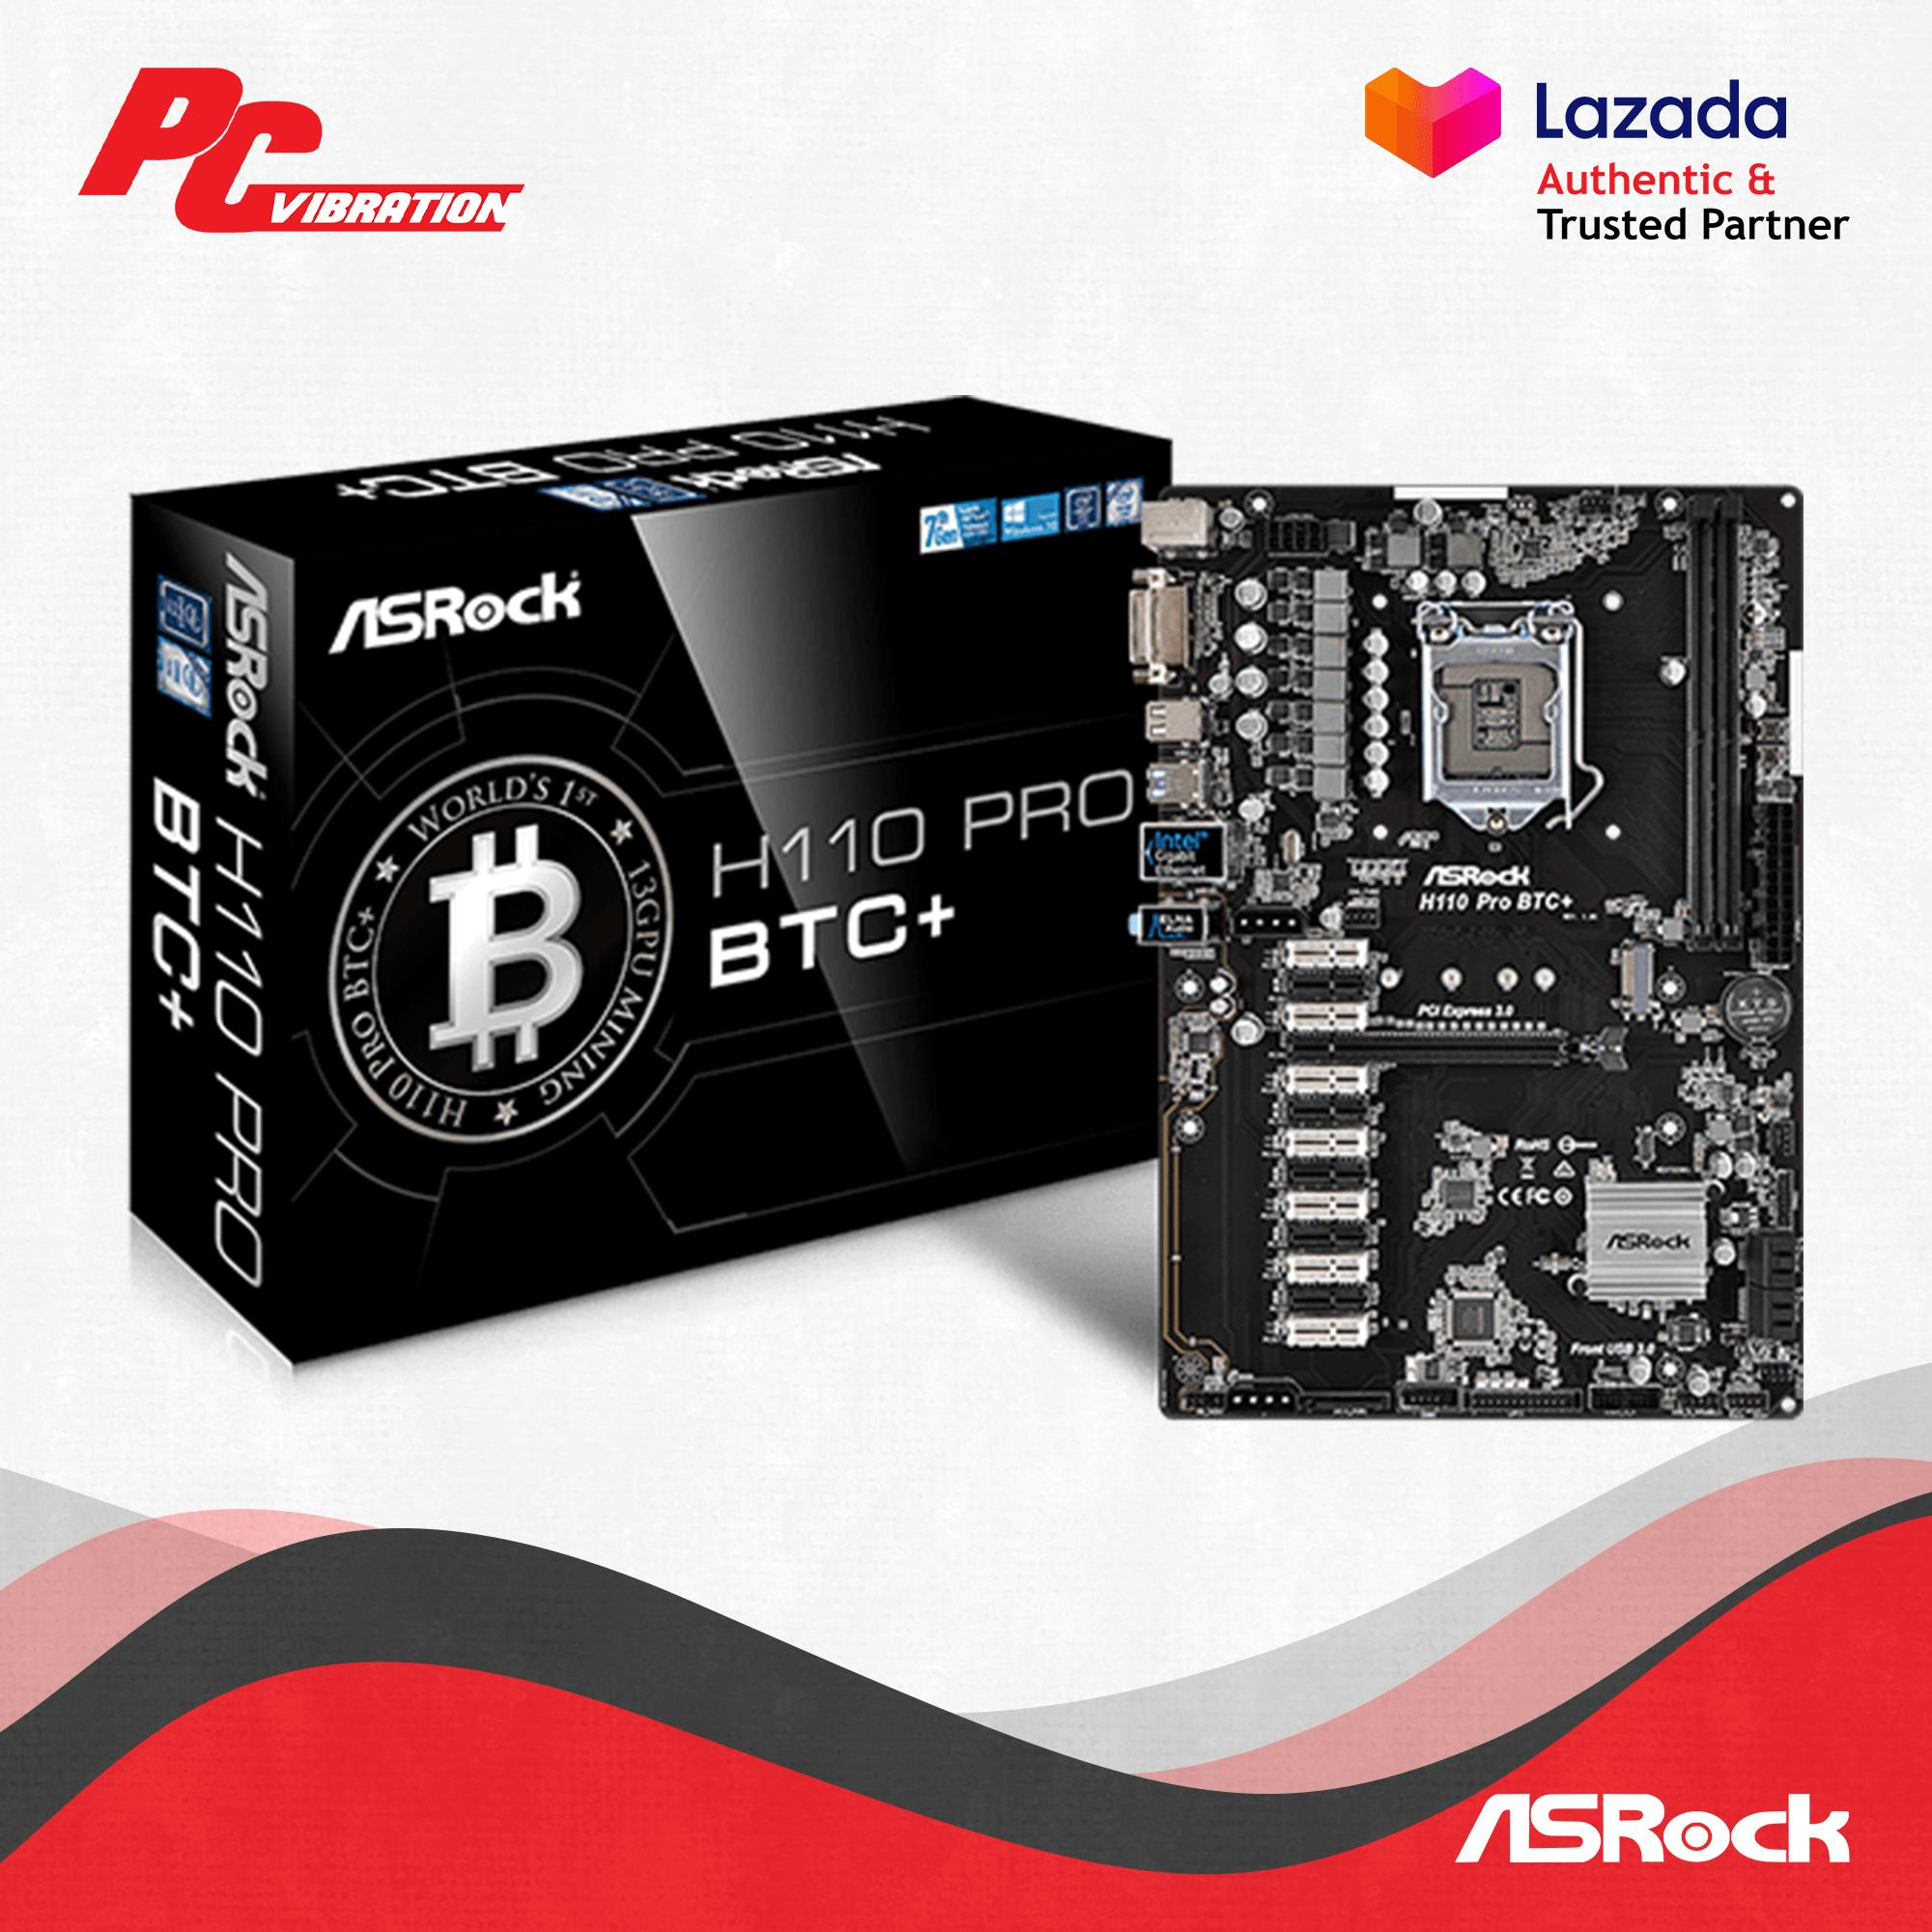 ASRock H110 Pro BTC+ 13 PCIe Crypto Mining ATX Motherboard [BTC PRO]